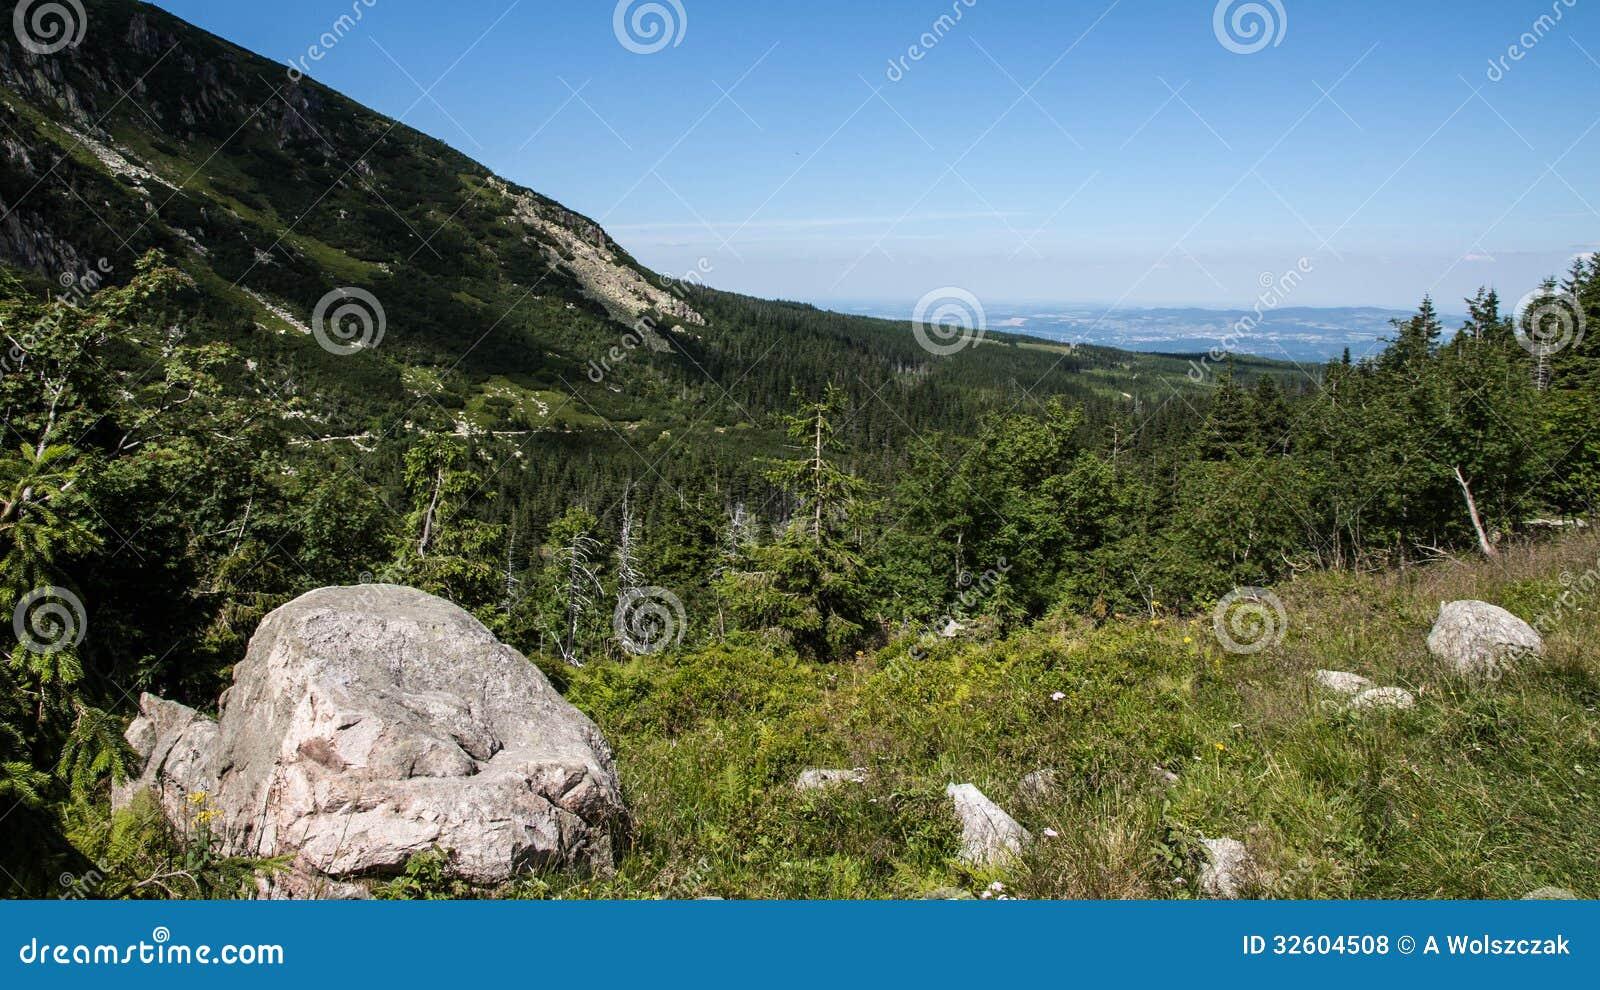 Mountain View de Karkonosze e Trekking